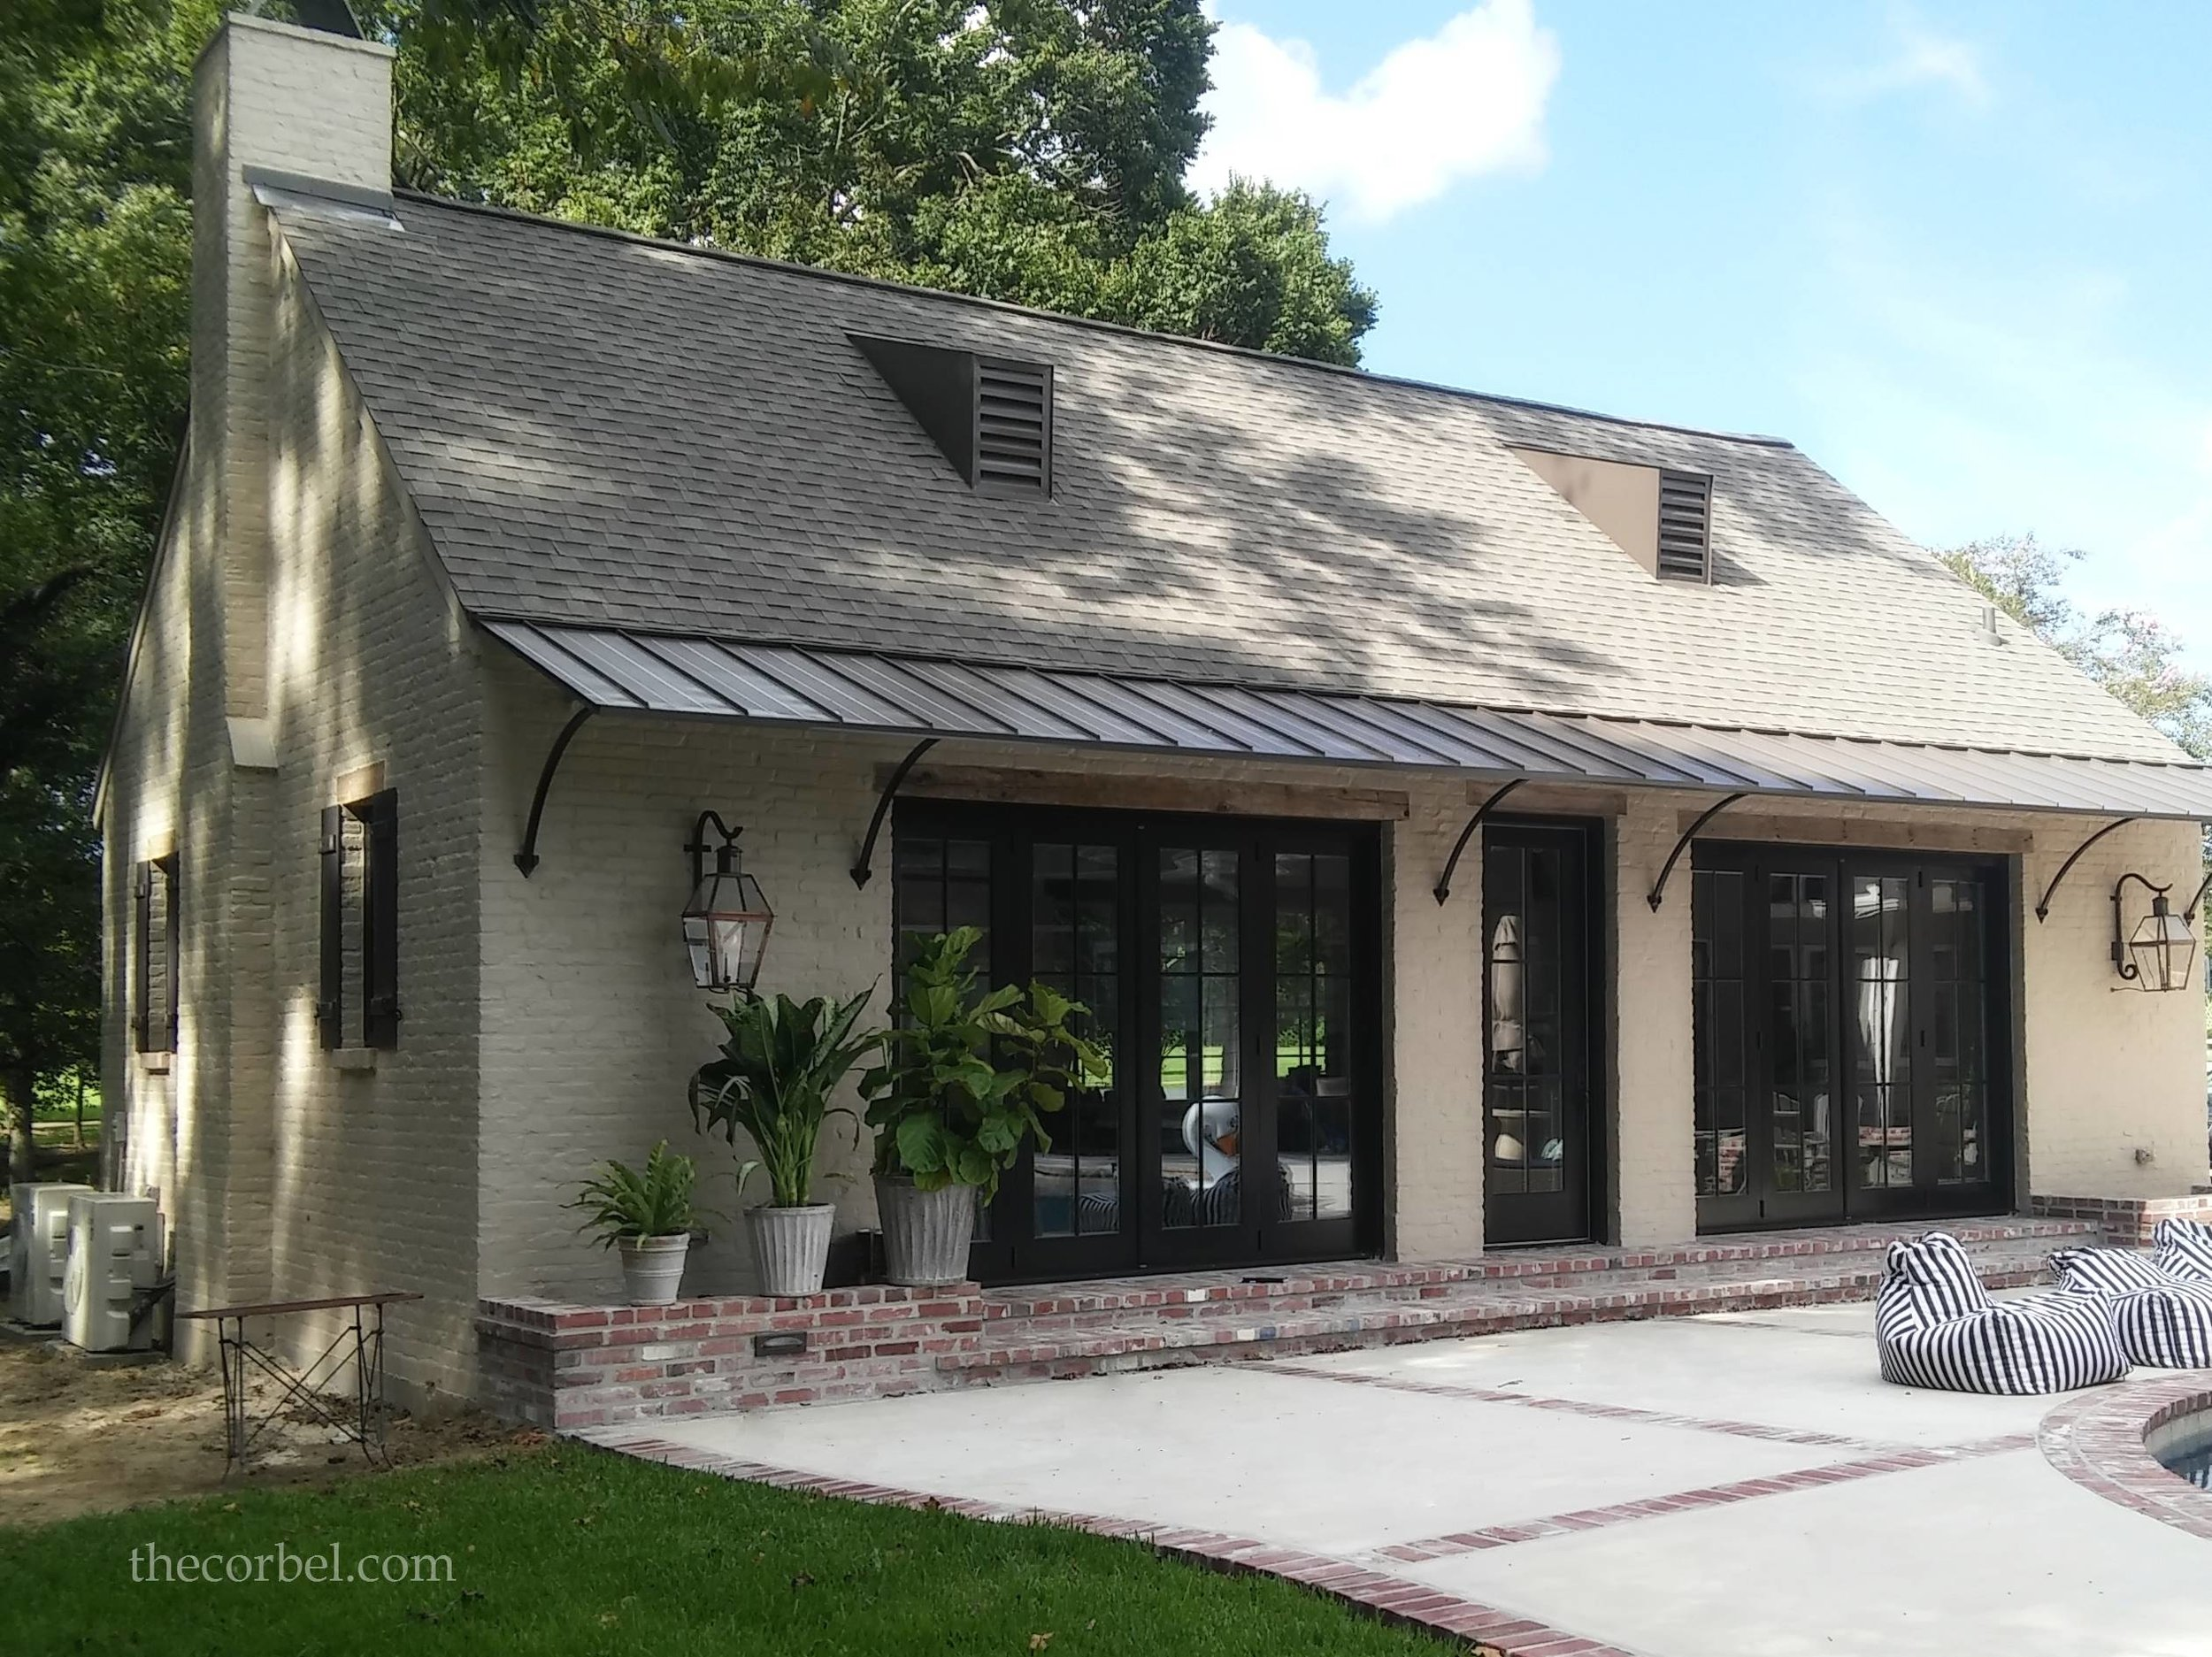 charlet bros poolhouse exterior.jpg